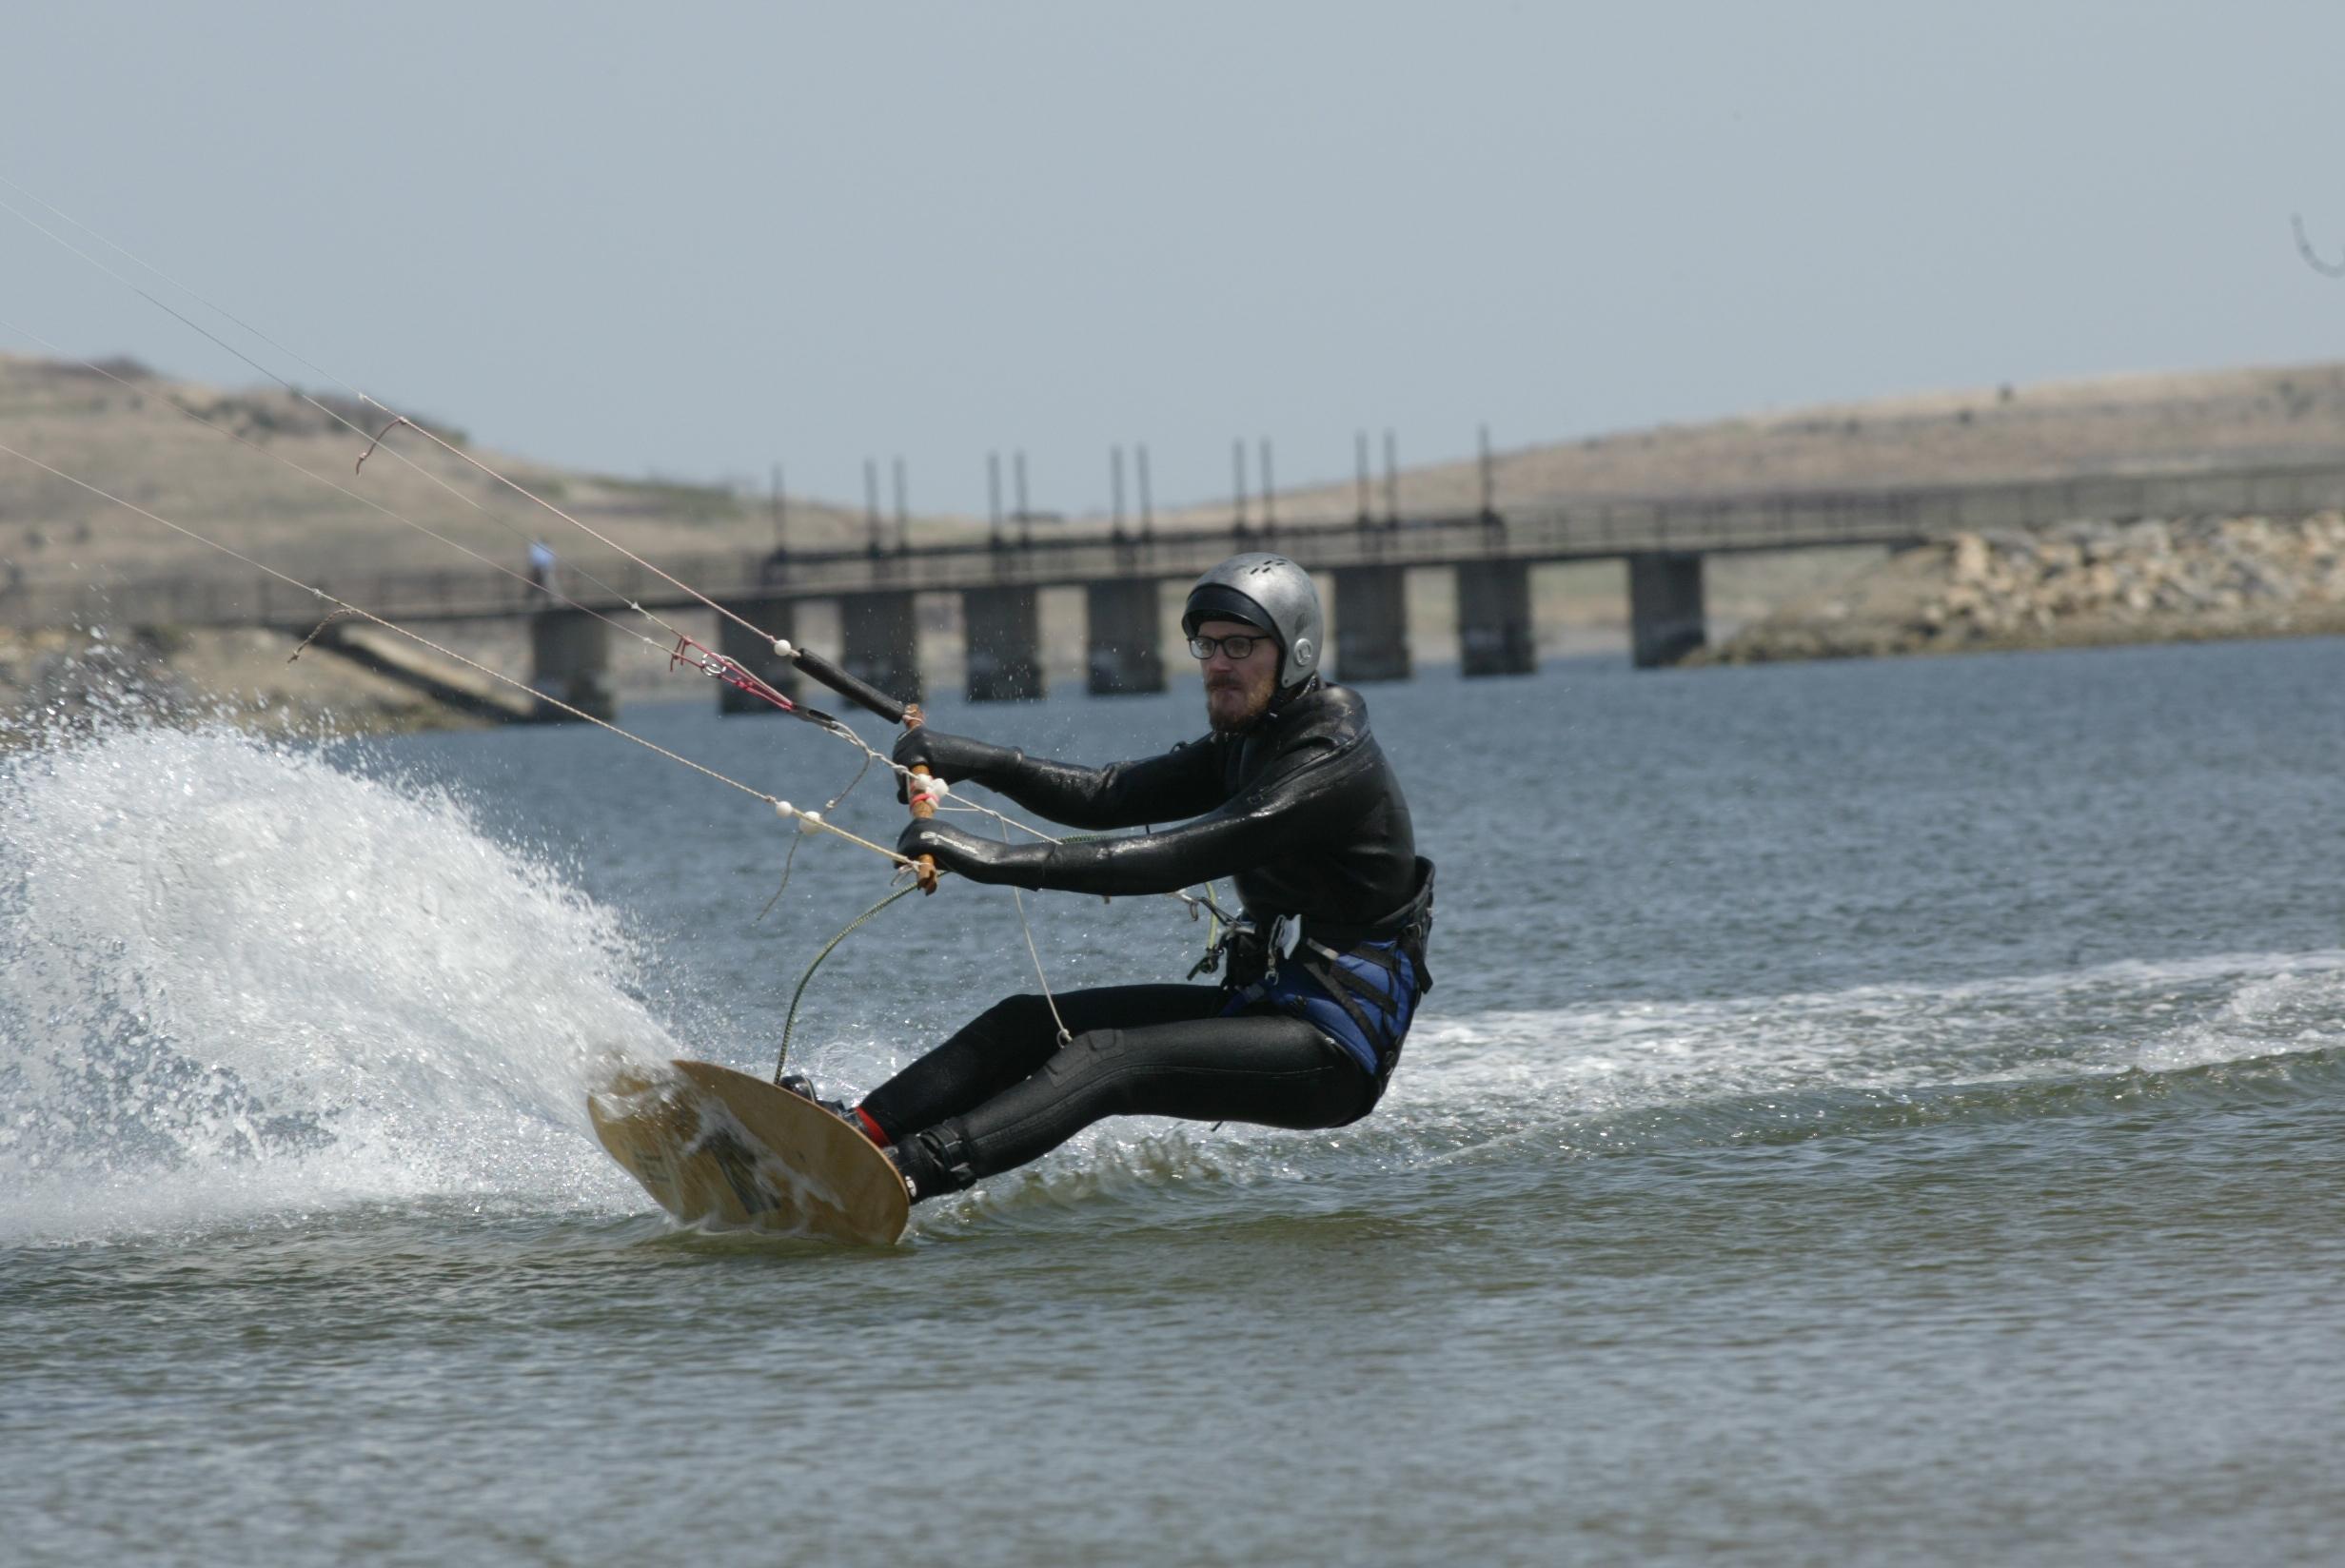 Plywood kiteboard